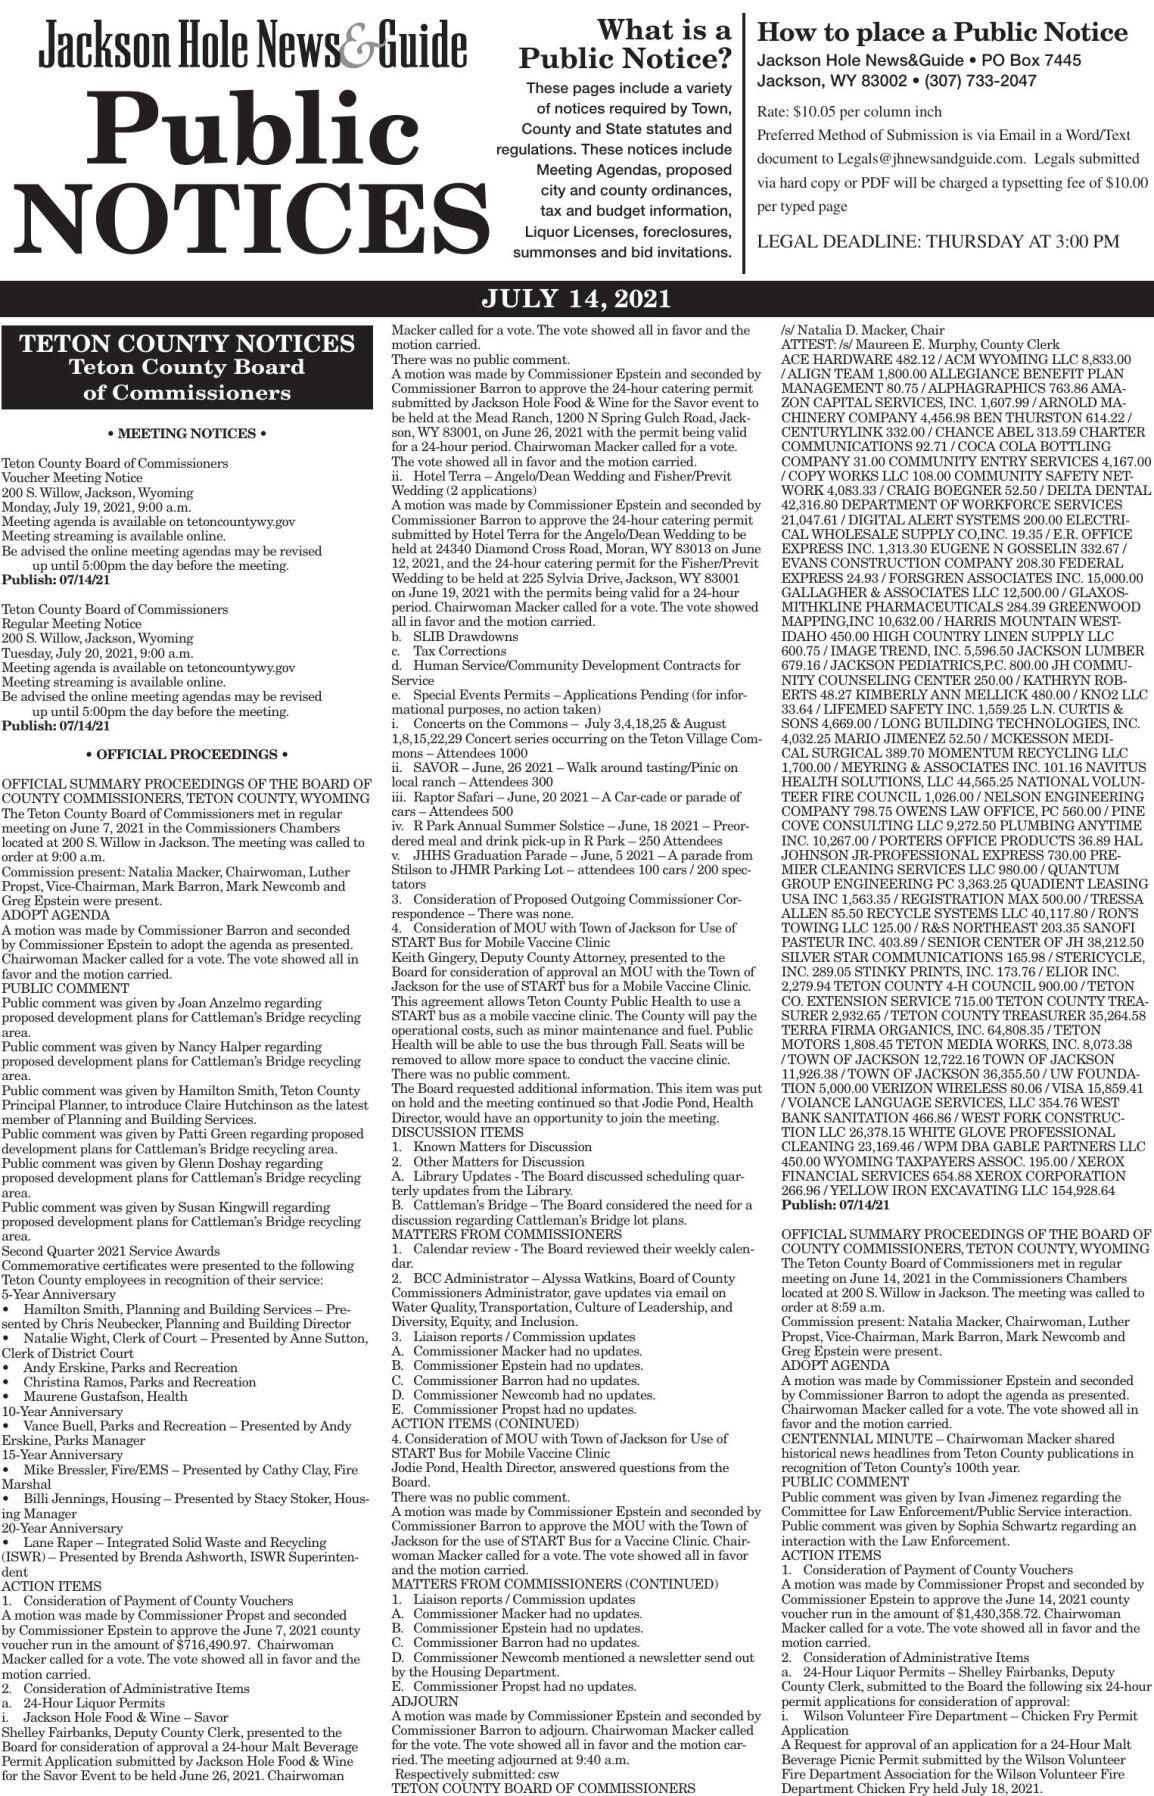 Public Notices, July 14, 2021